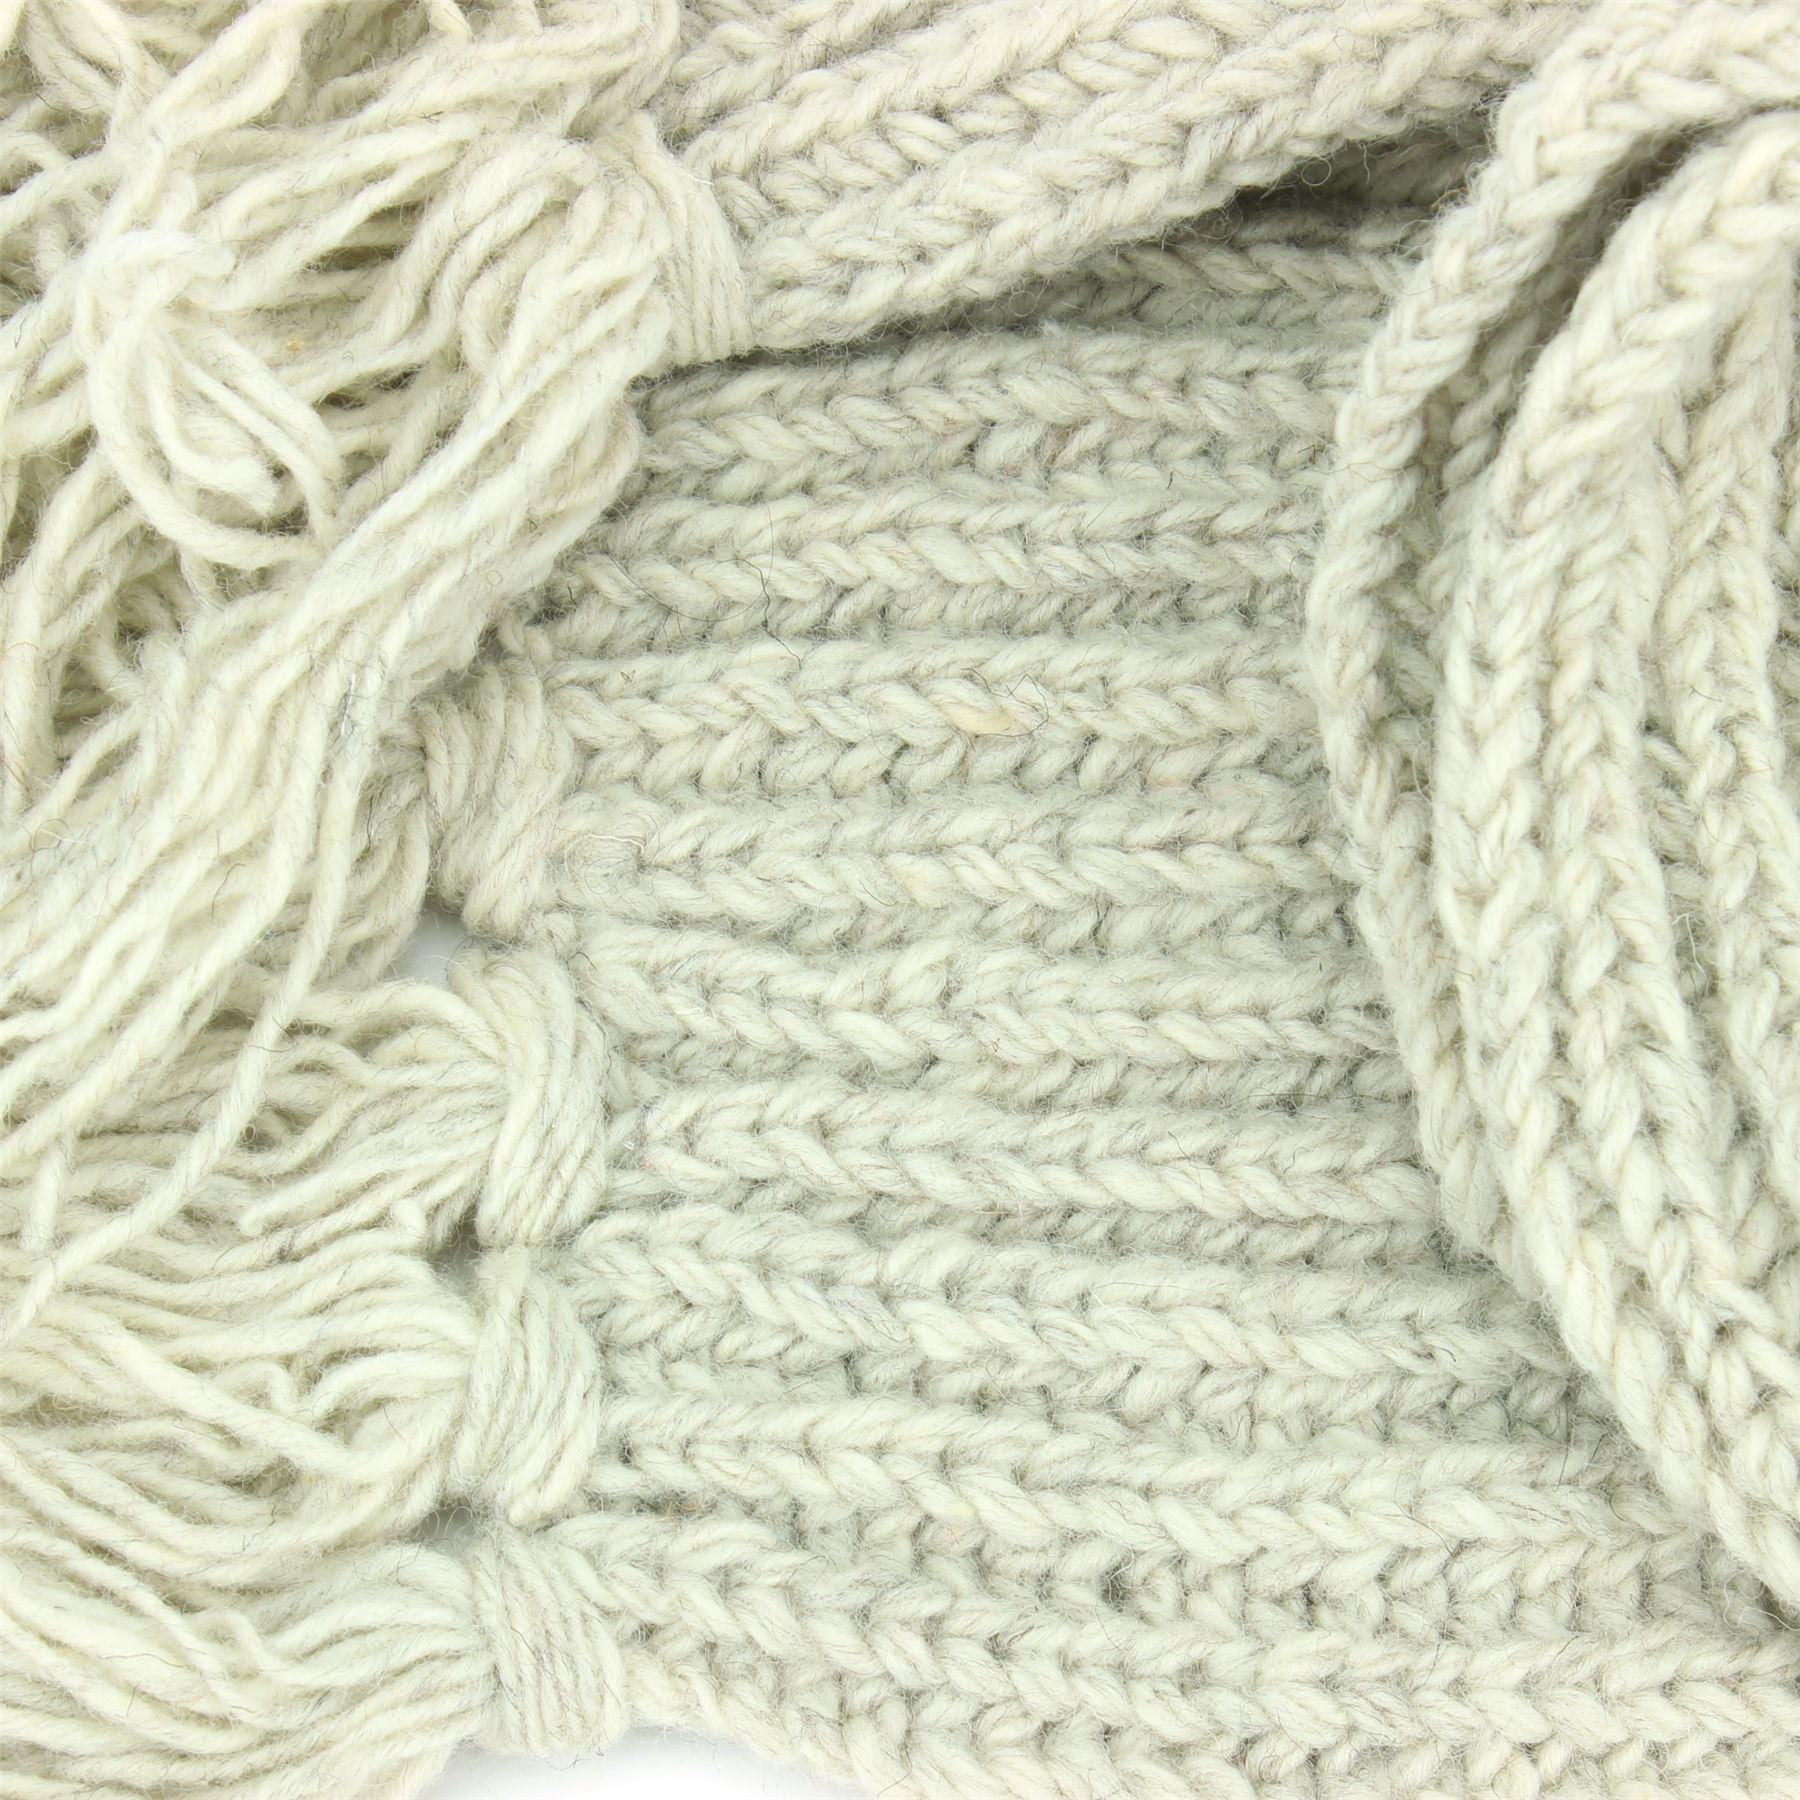 Wool Scarf Chunky Knit Tassels Long Knitted Warm PLAIN Shawl LoudElephant